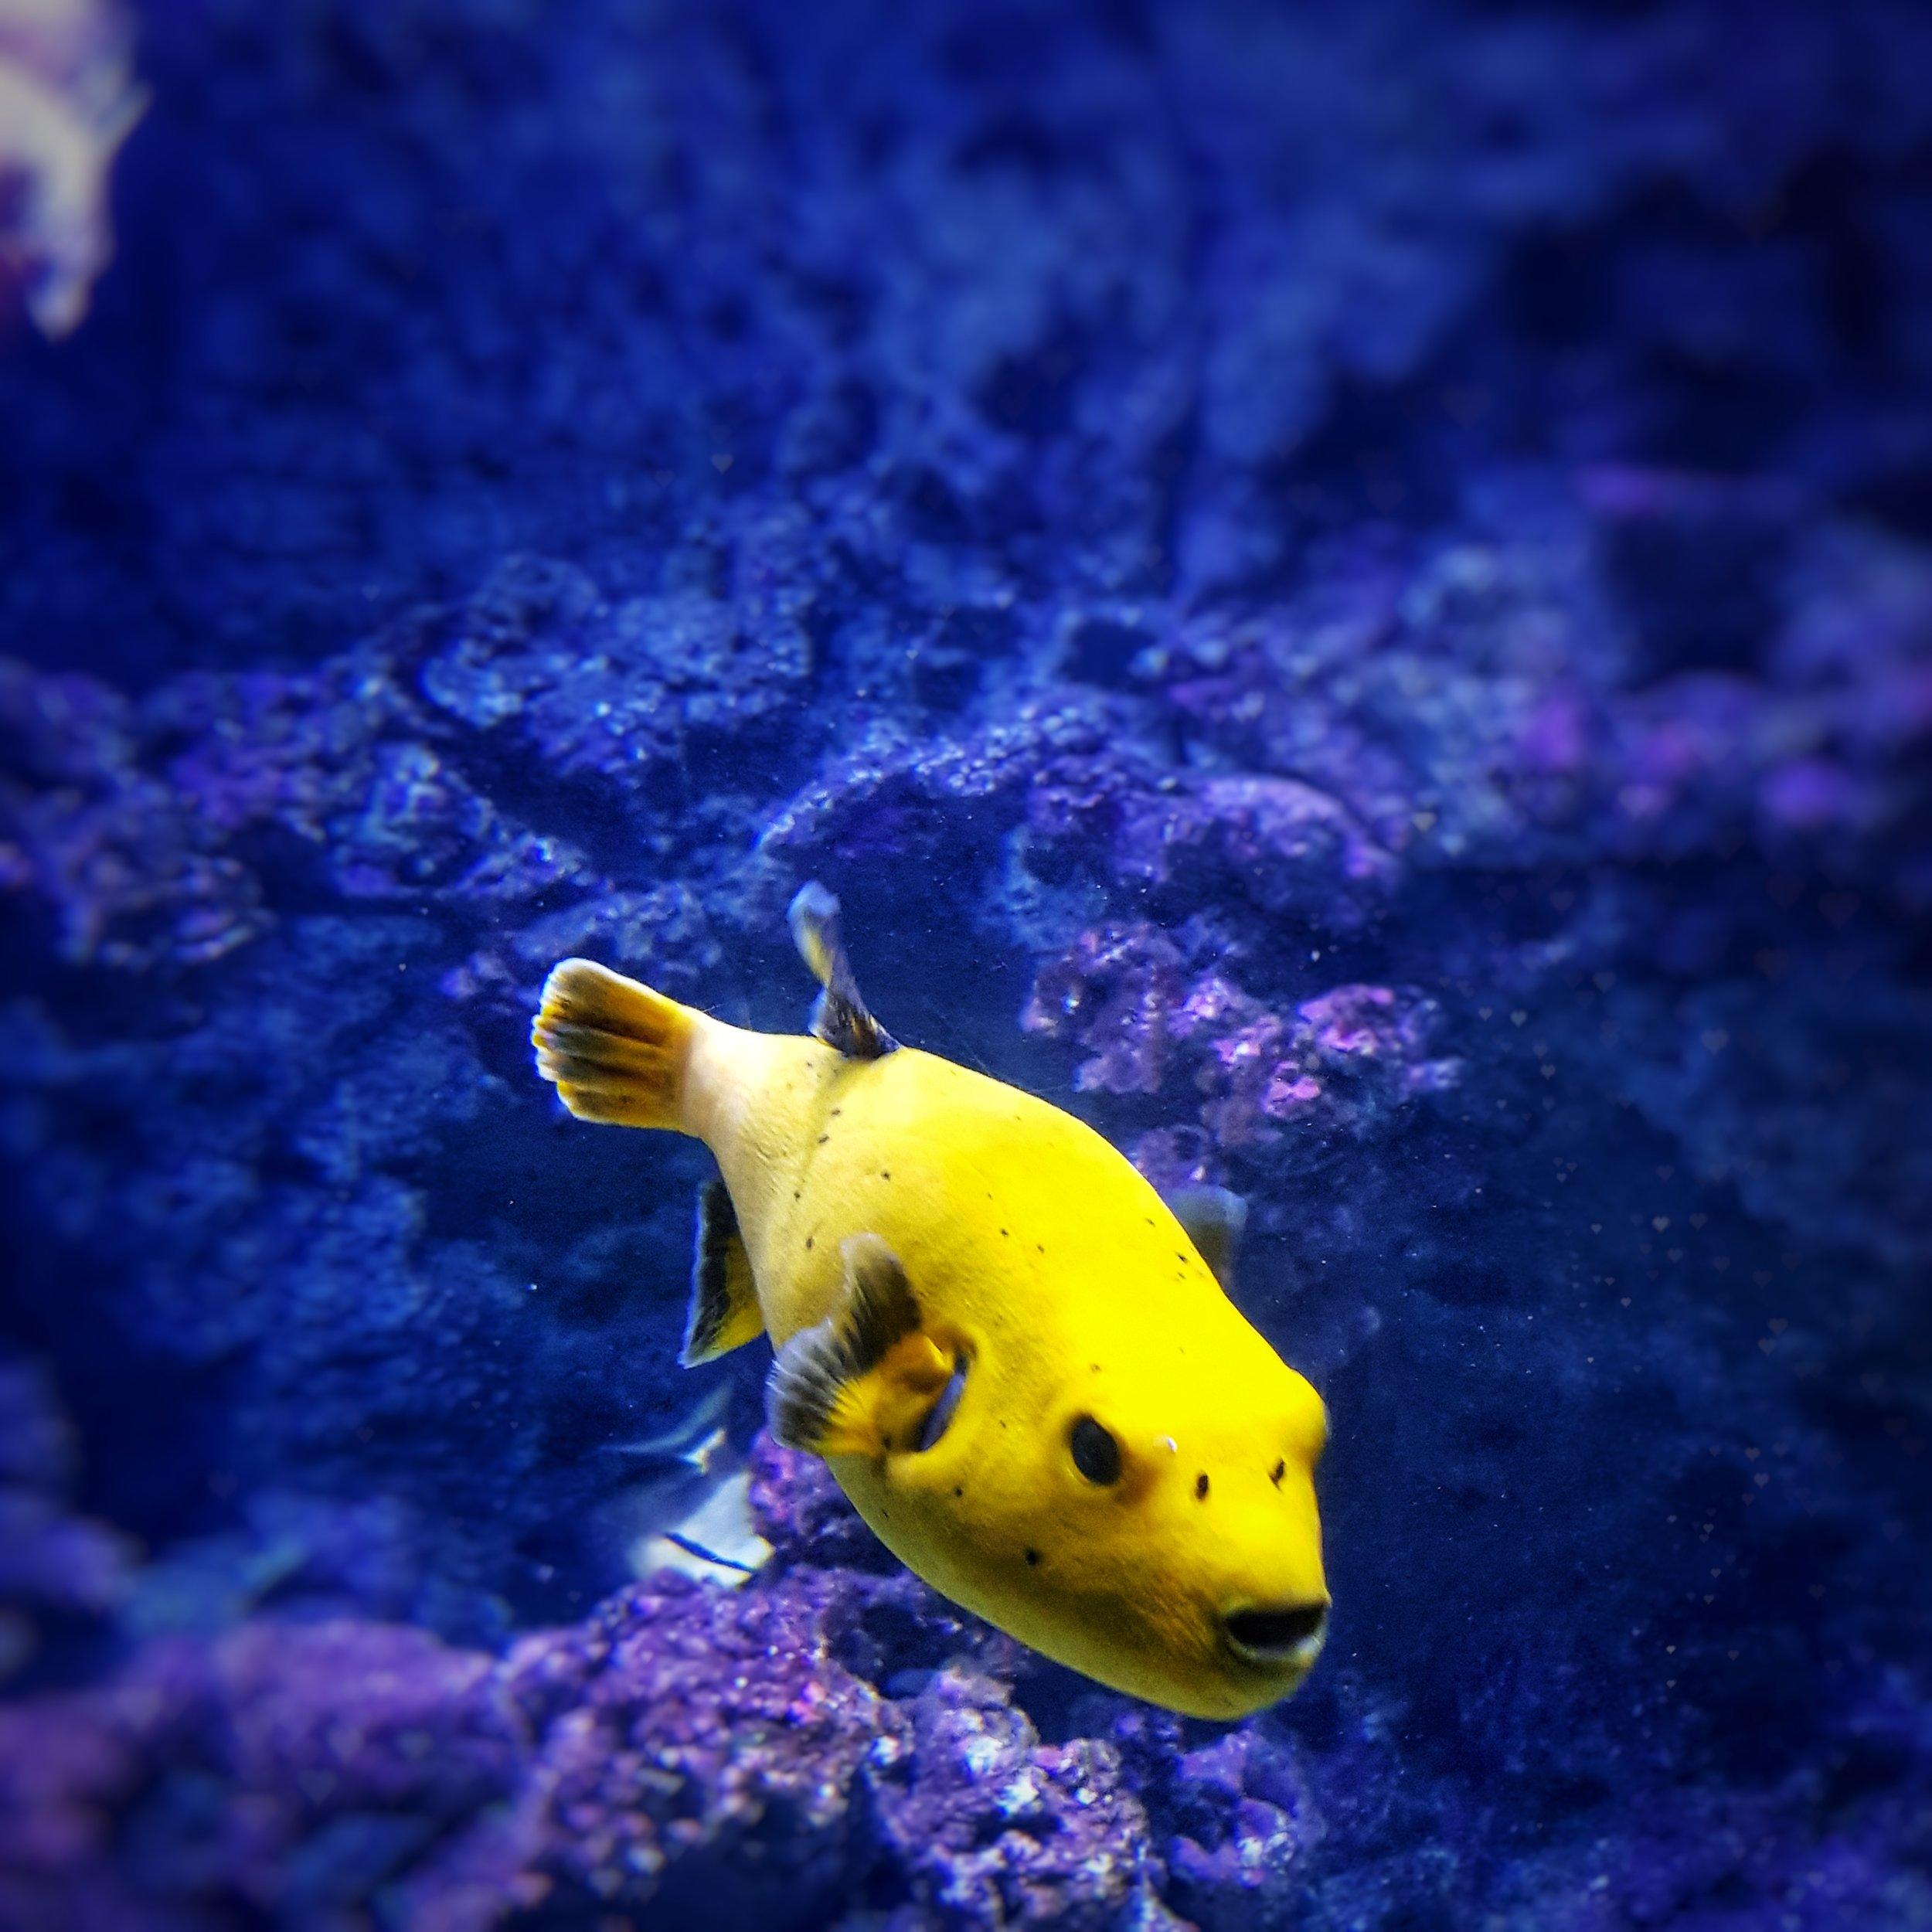 Day 202 - July 21: At the Aquarium